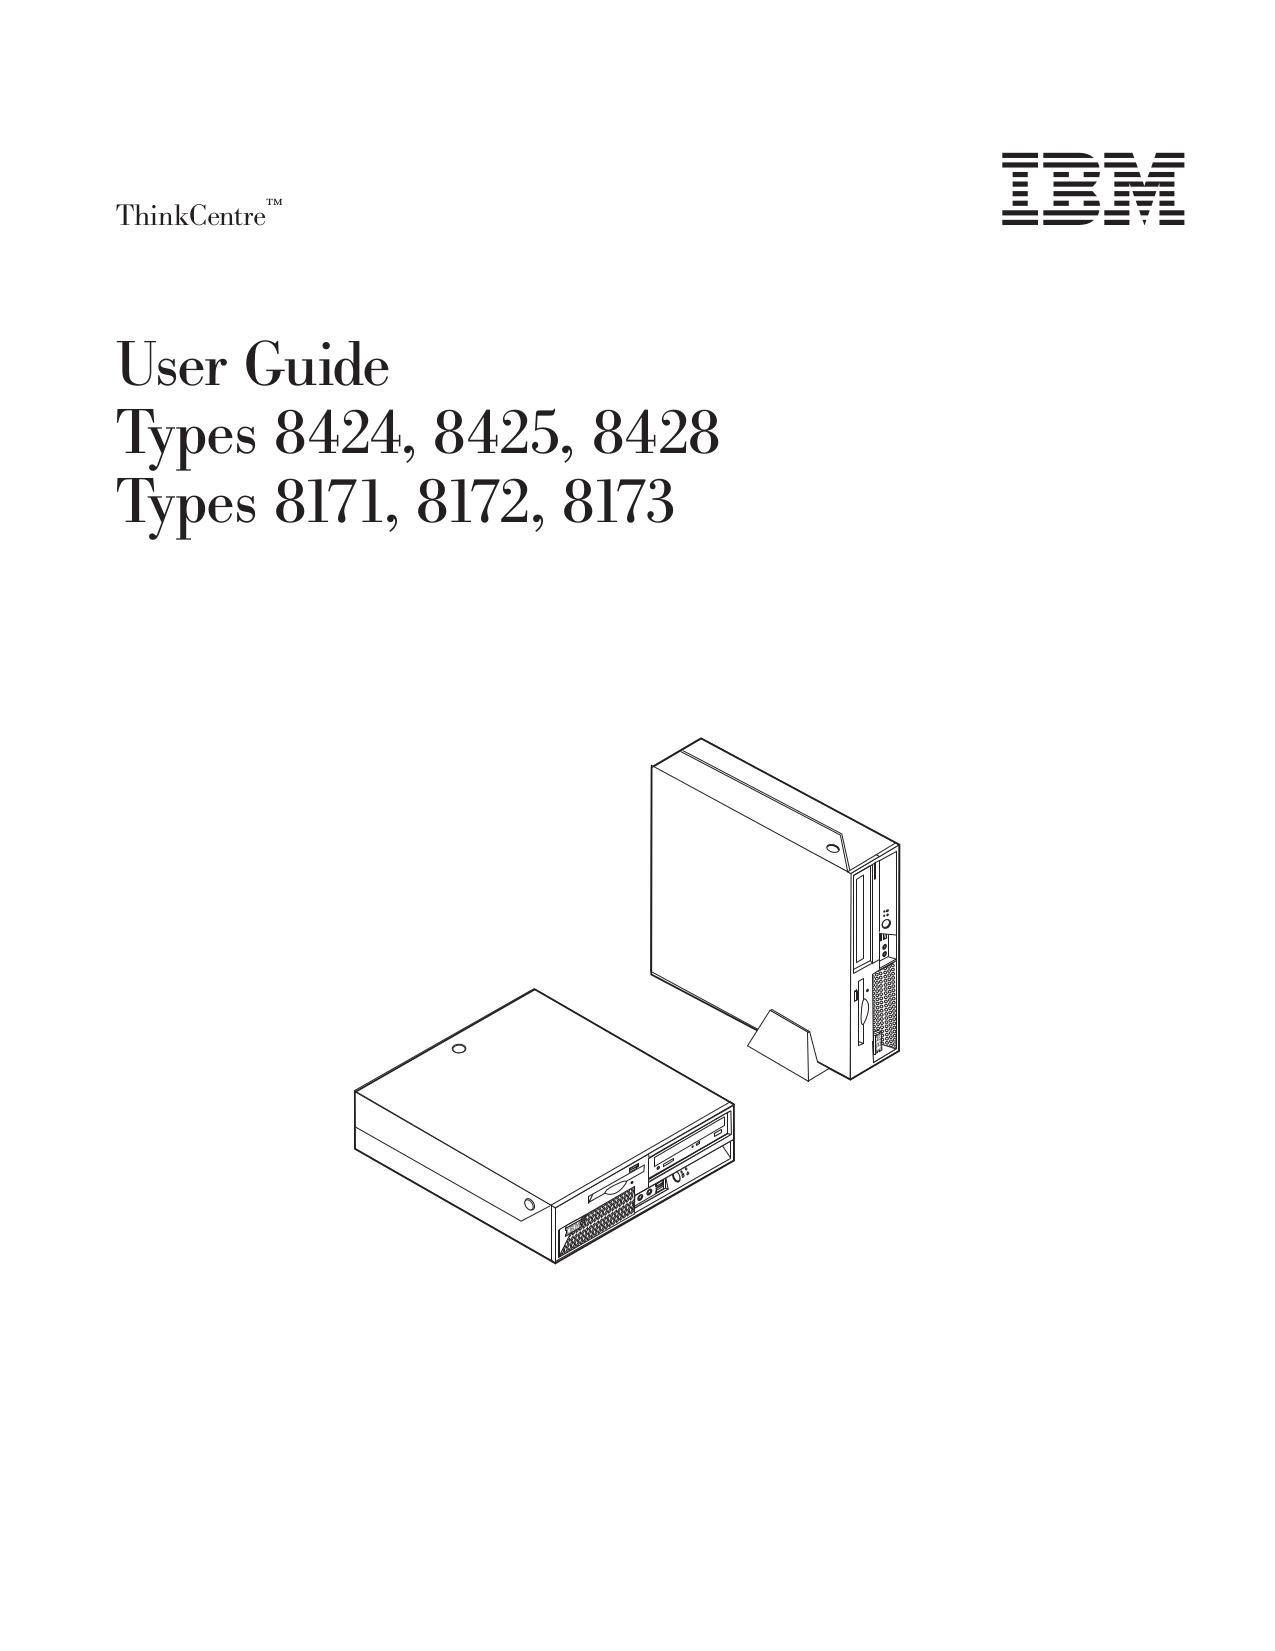 pdf for Lenovo Desktop ThinkCentre S51 8173 manual